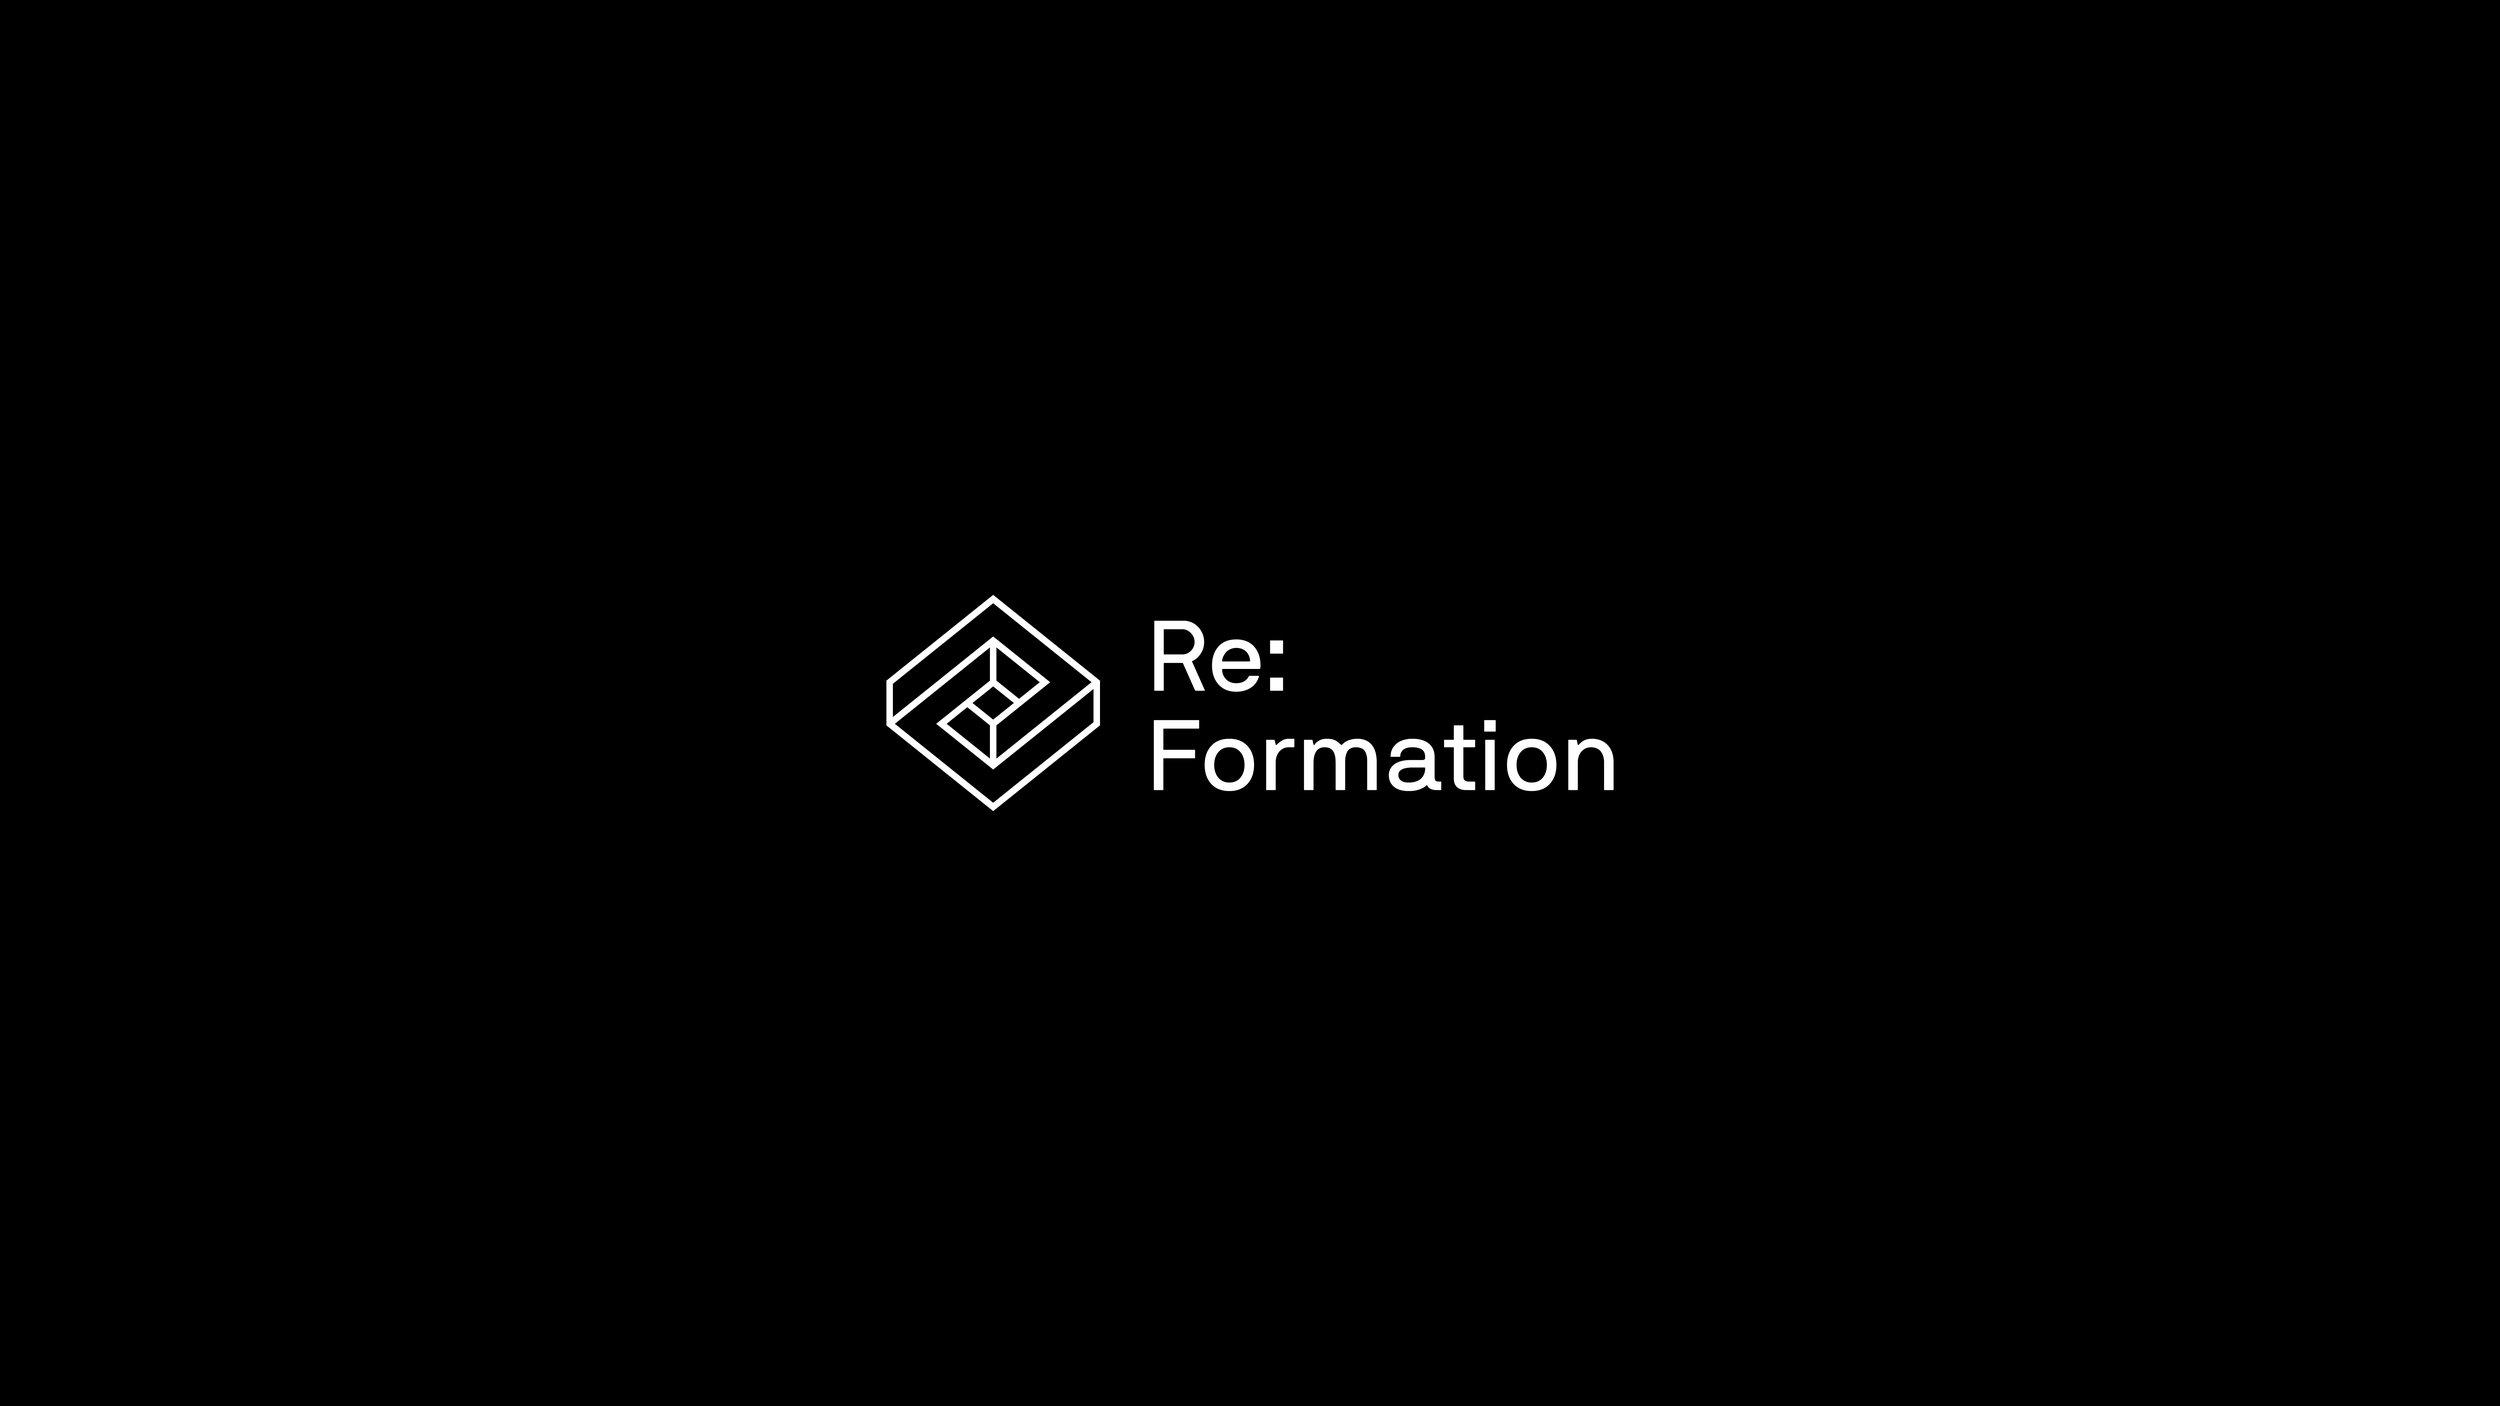 ReFormation_Final-07.jpg